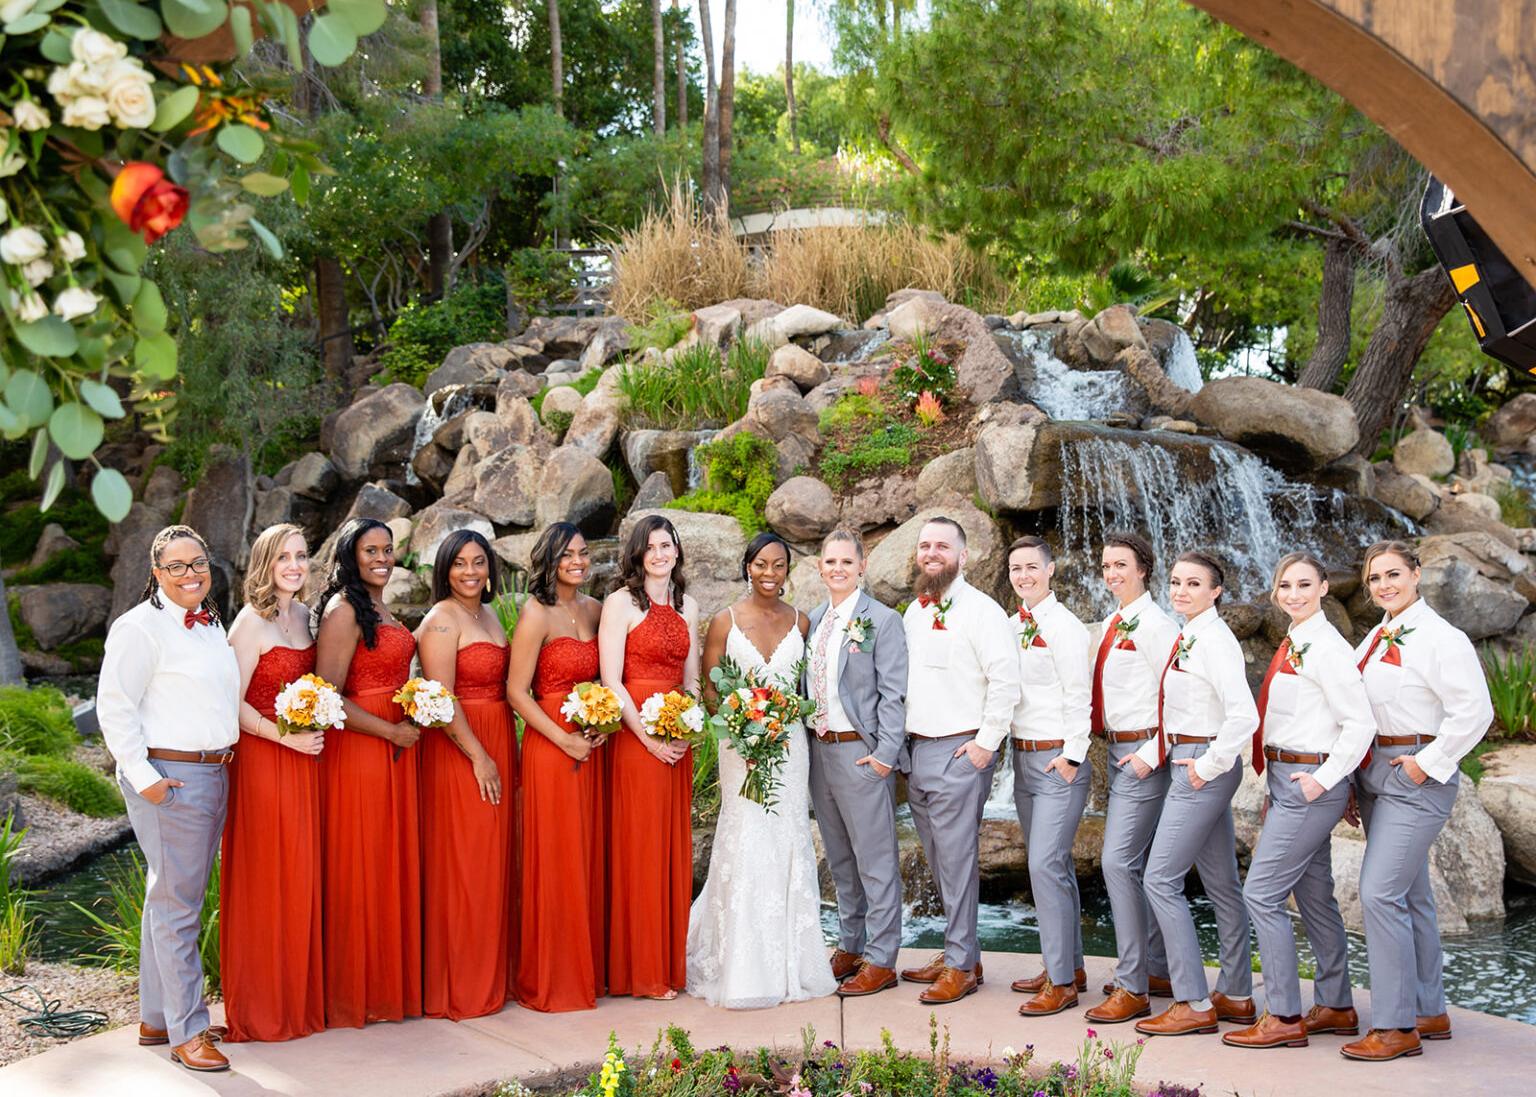 Breauna-and-Anna-Wedding_-DePoy-Studios-5x7-1